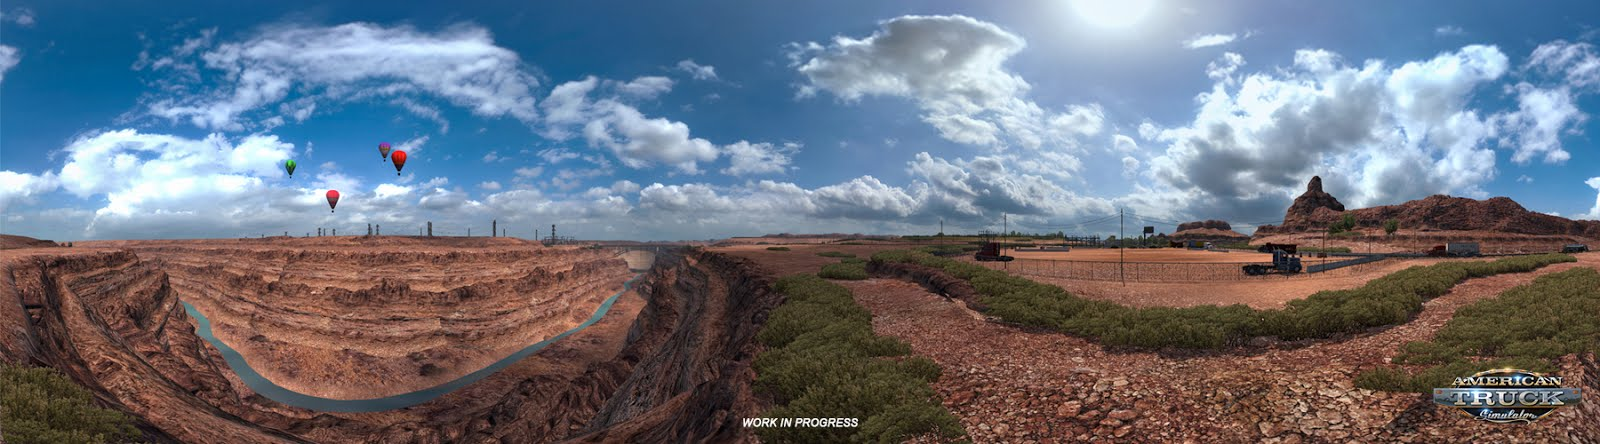 American Truck Simulator Glen Canyon.jpg